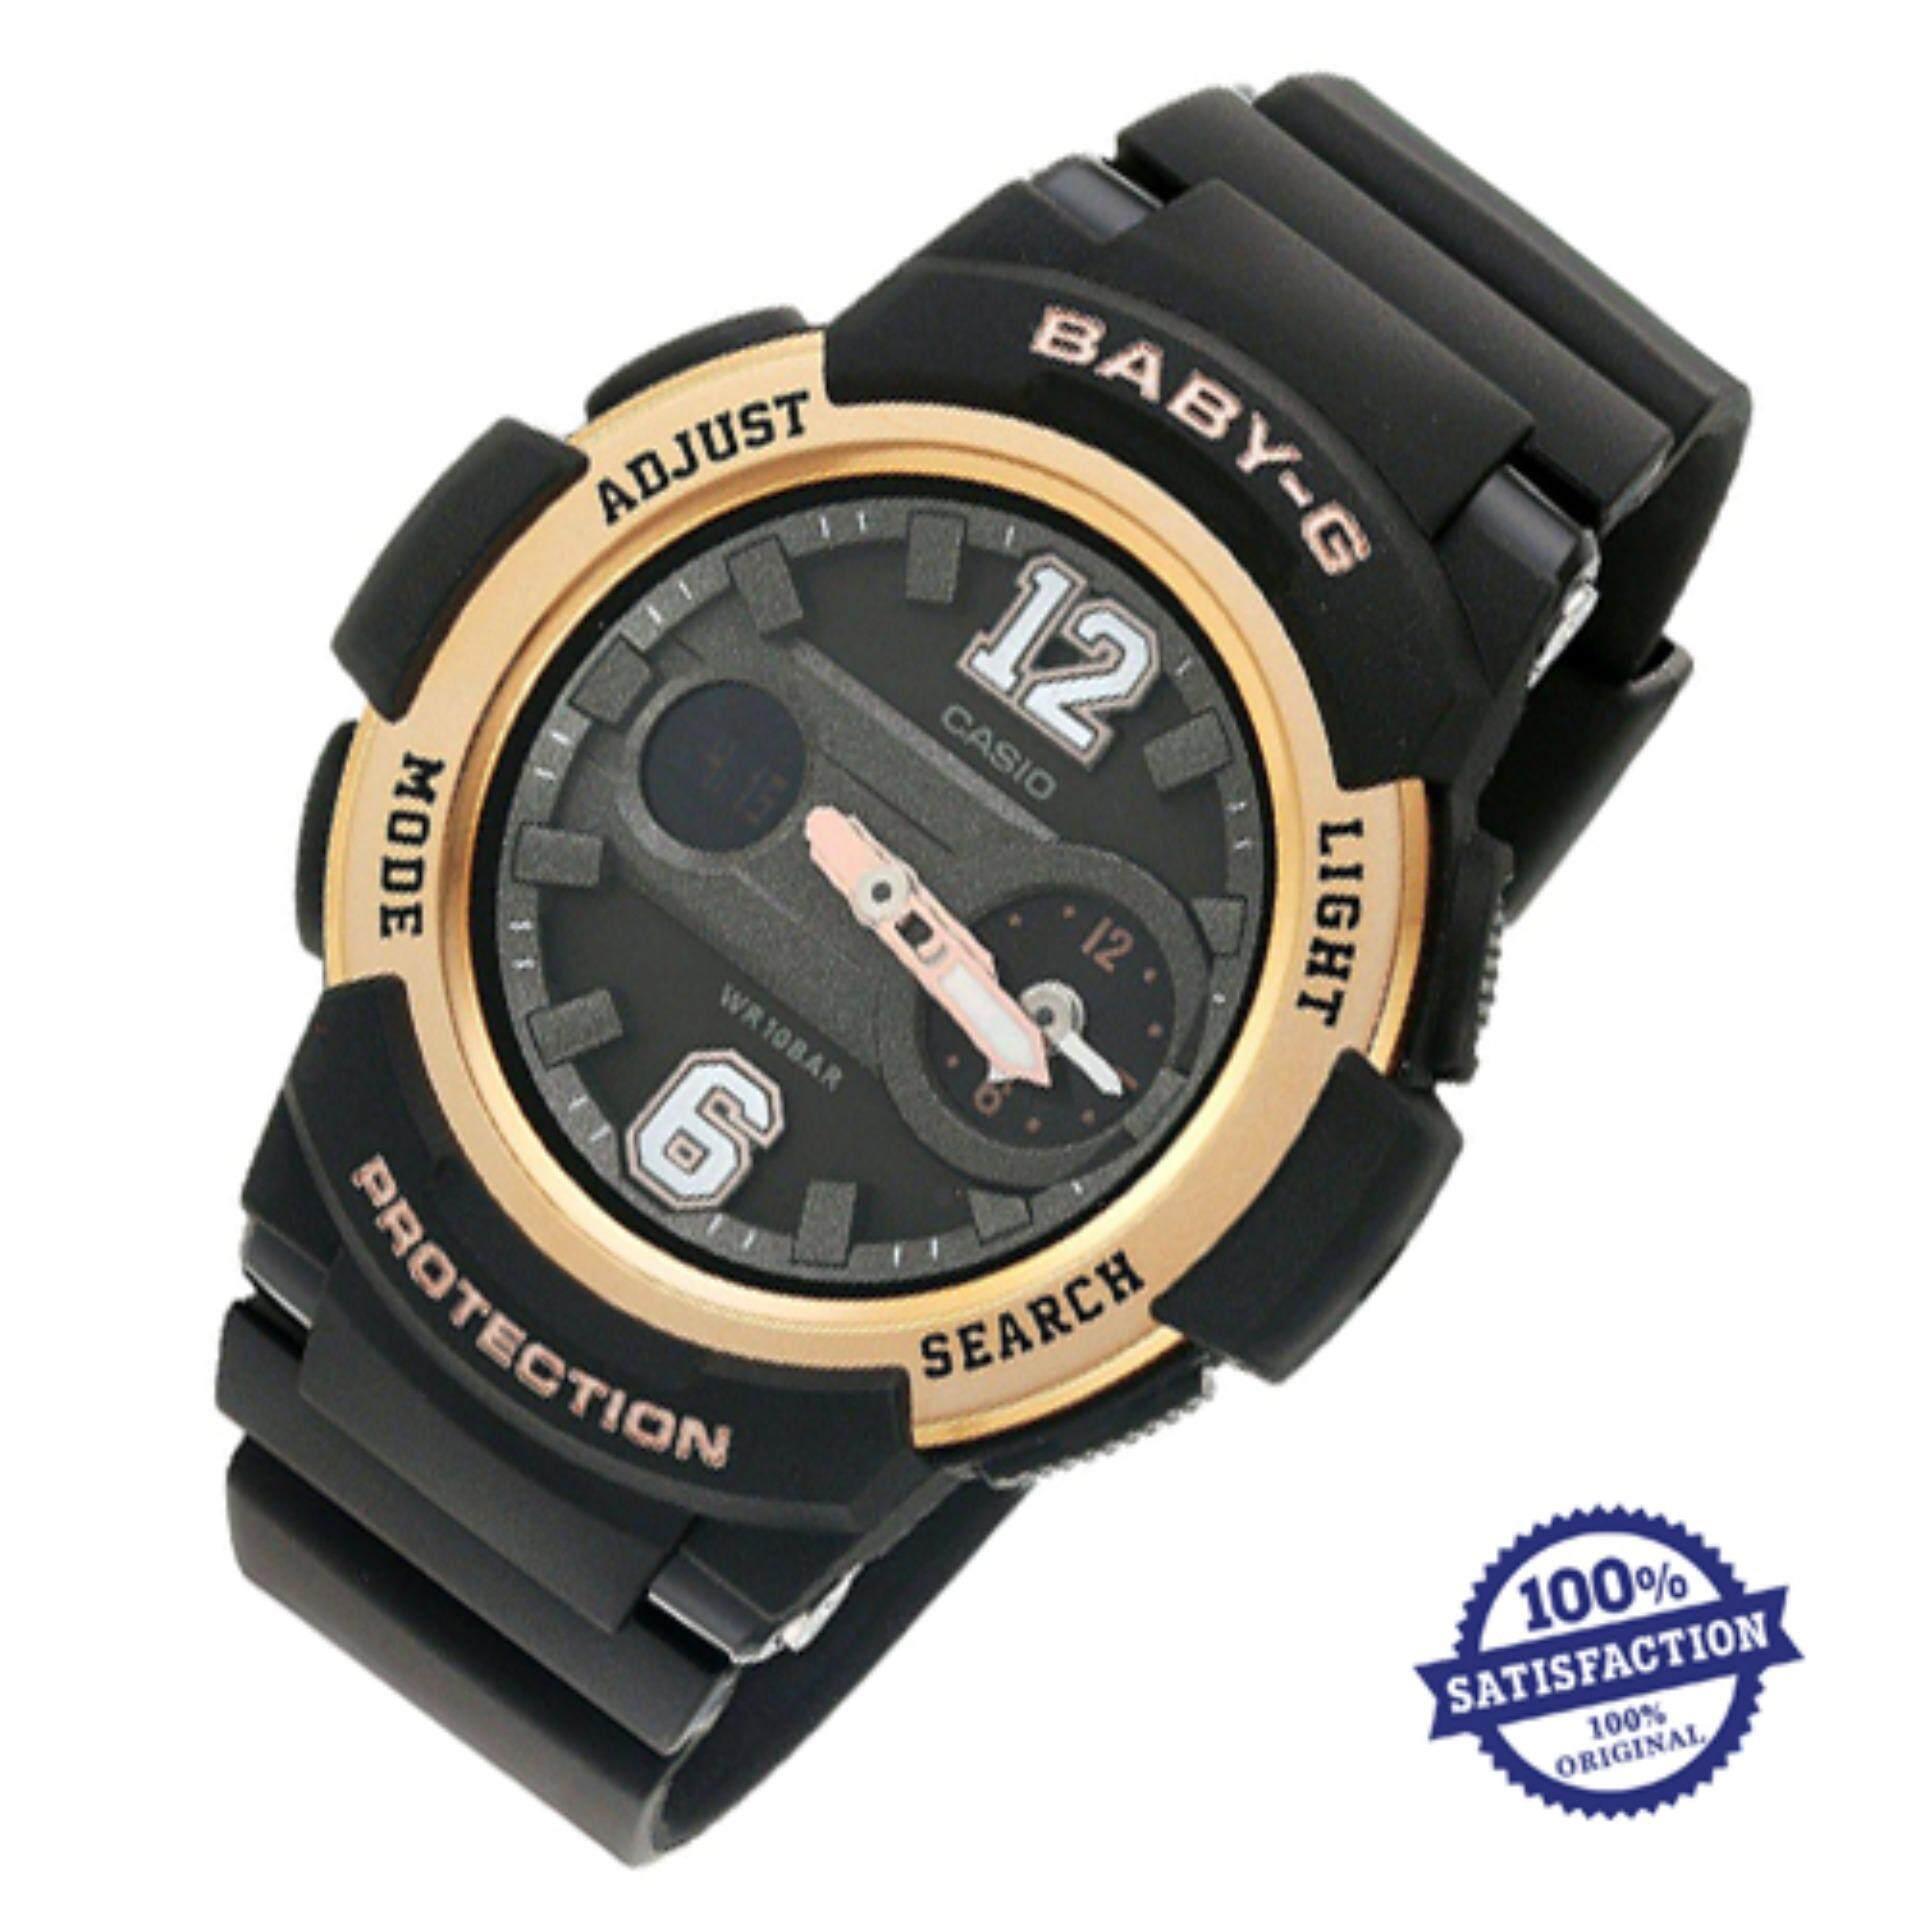 Features Casio Baby G Womens Watch Bga 210 1b Black Dan Harga 190